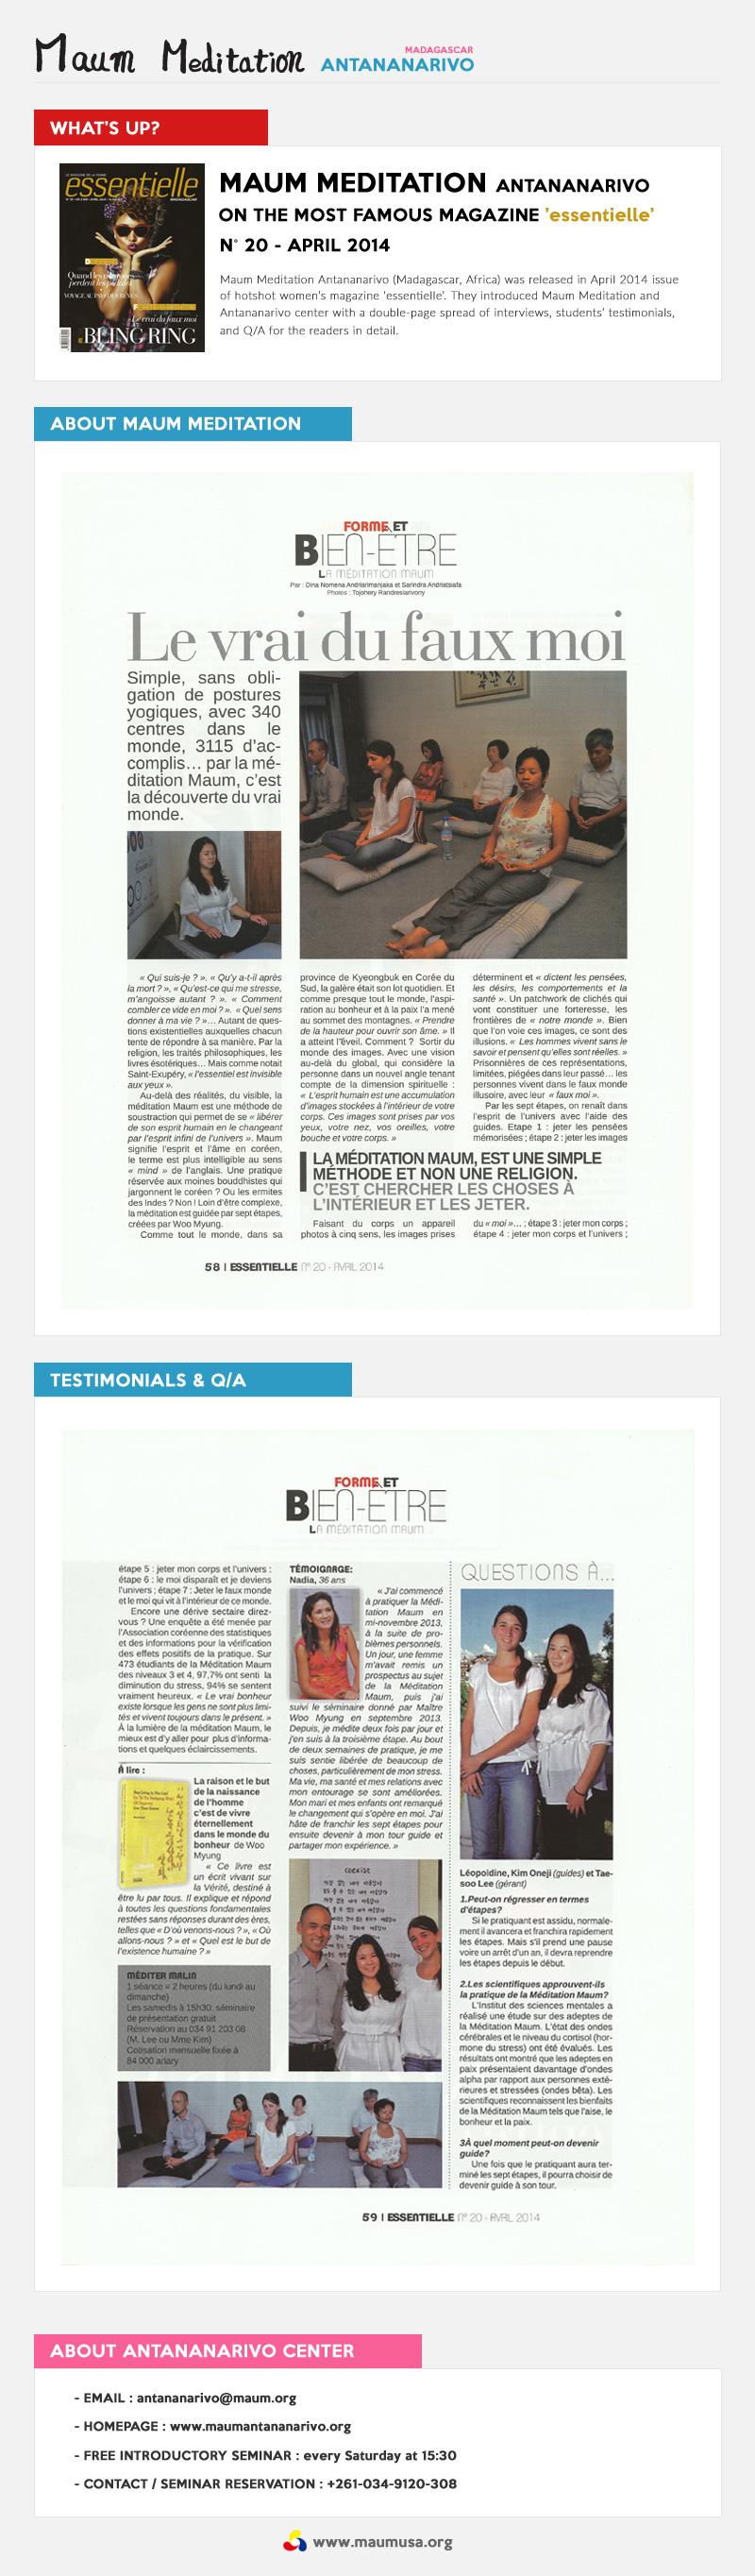 Meditation Antananarivo on Magazine 'Essentielle'